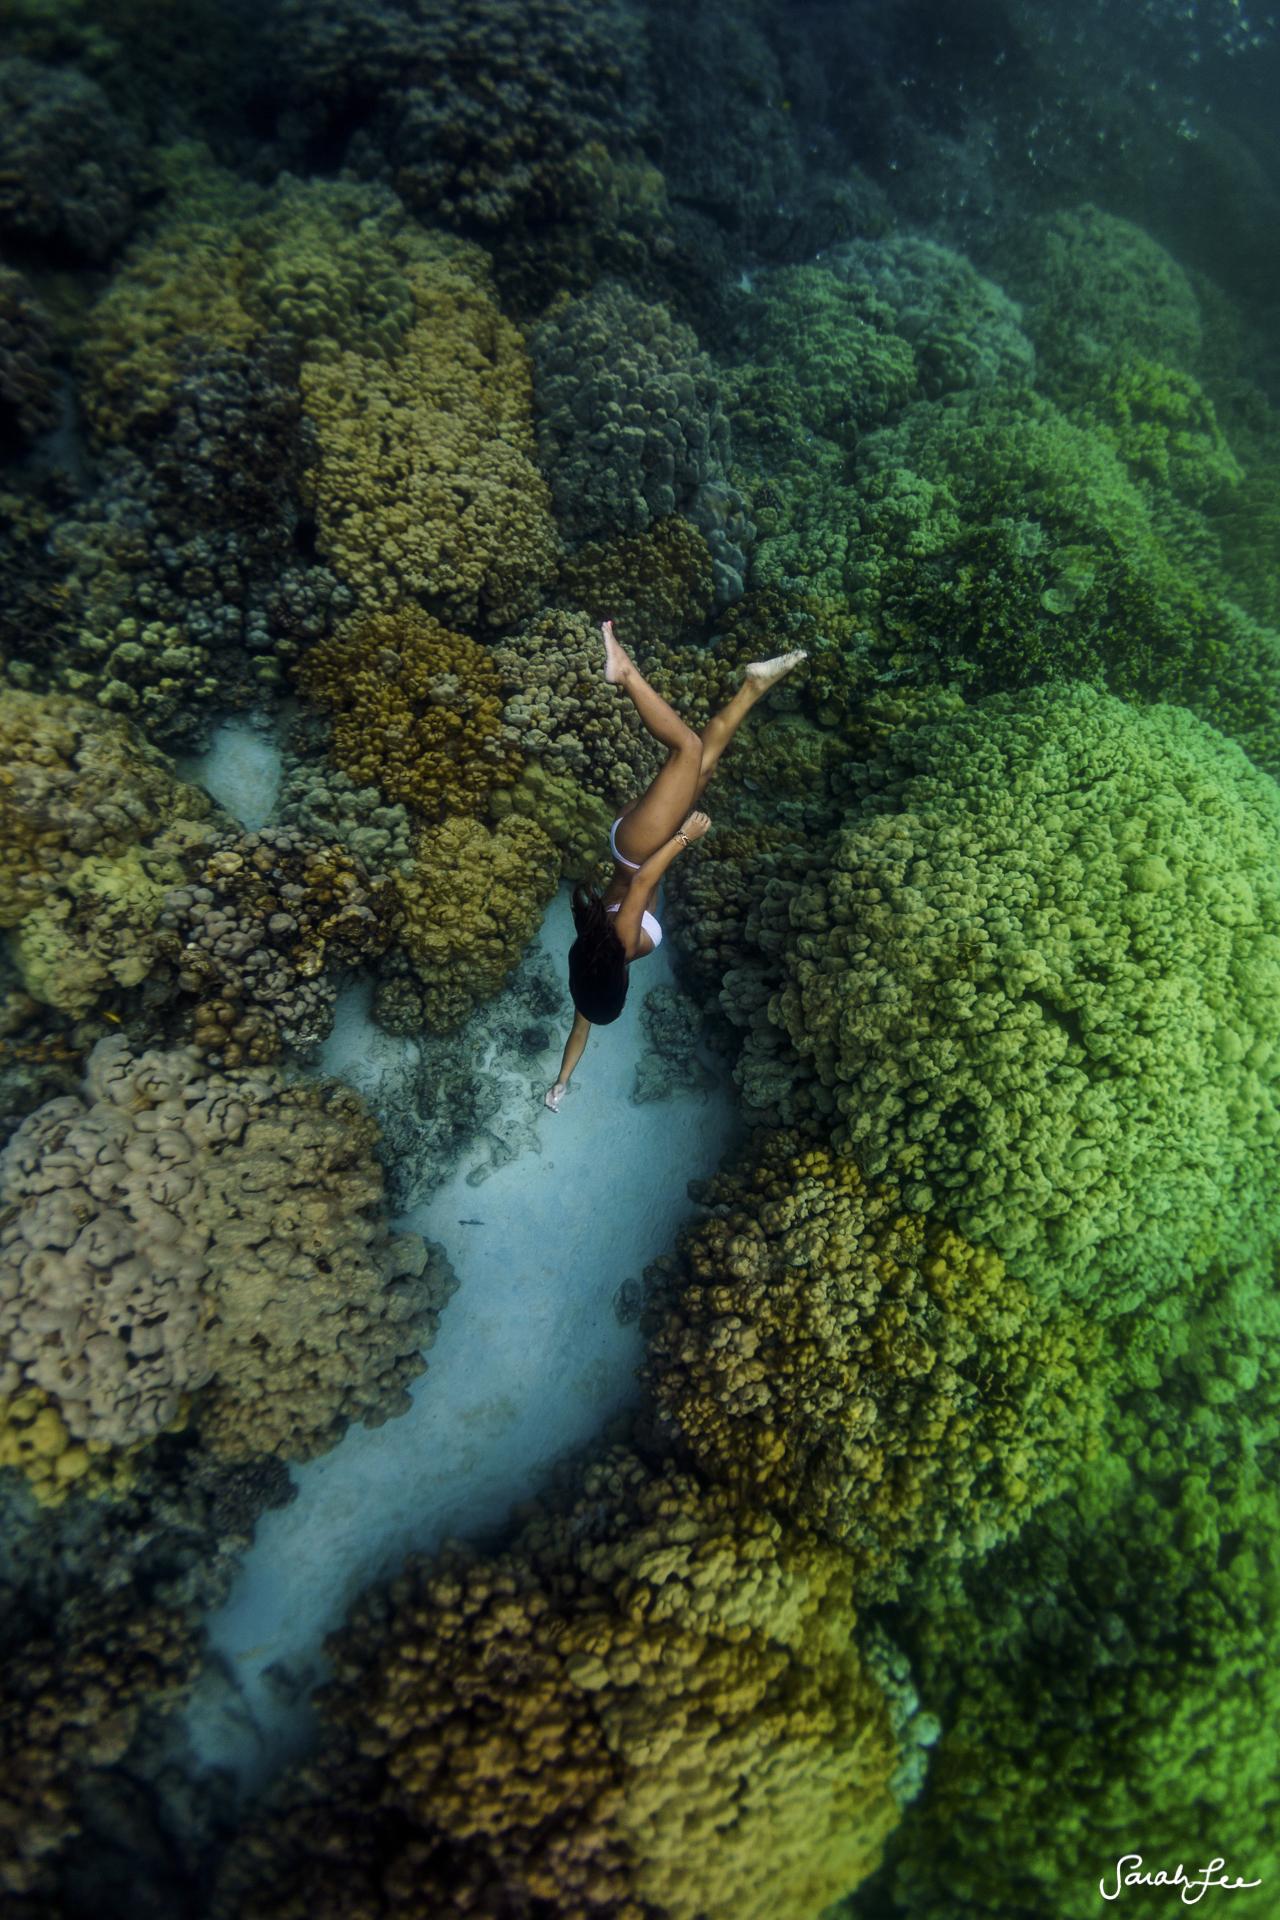 033_Sarah_Lee_Photography_Underwater_3432.jpg